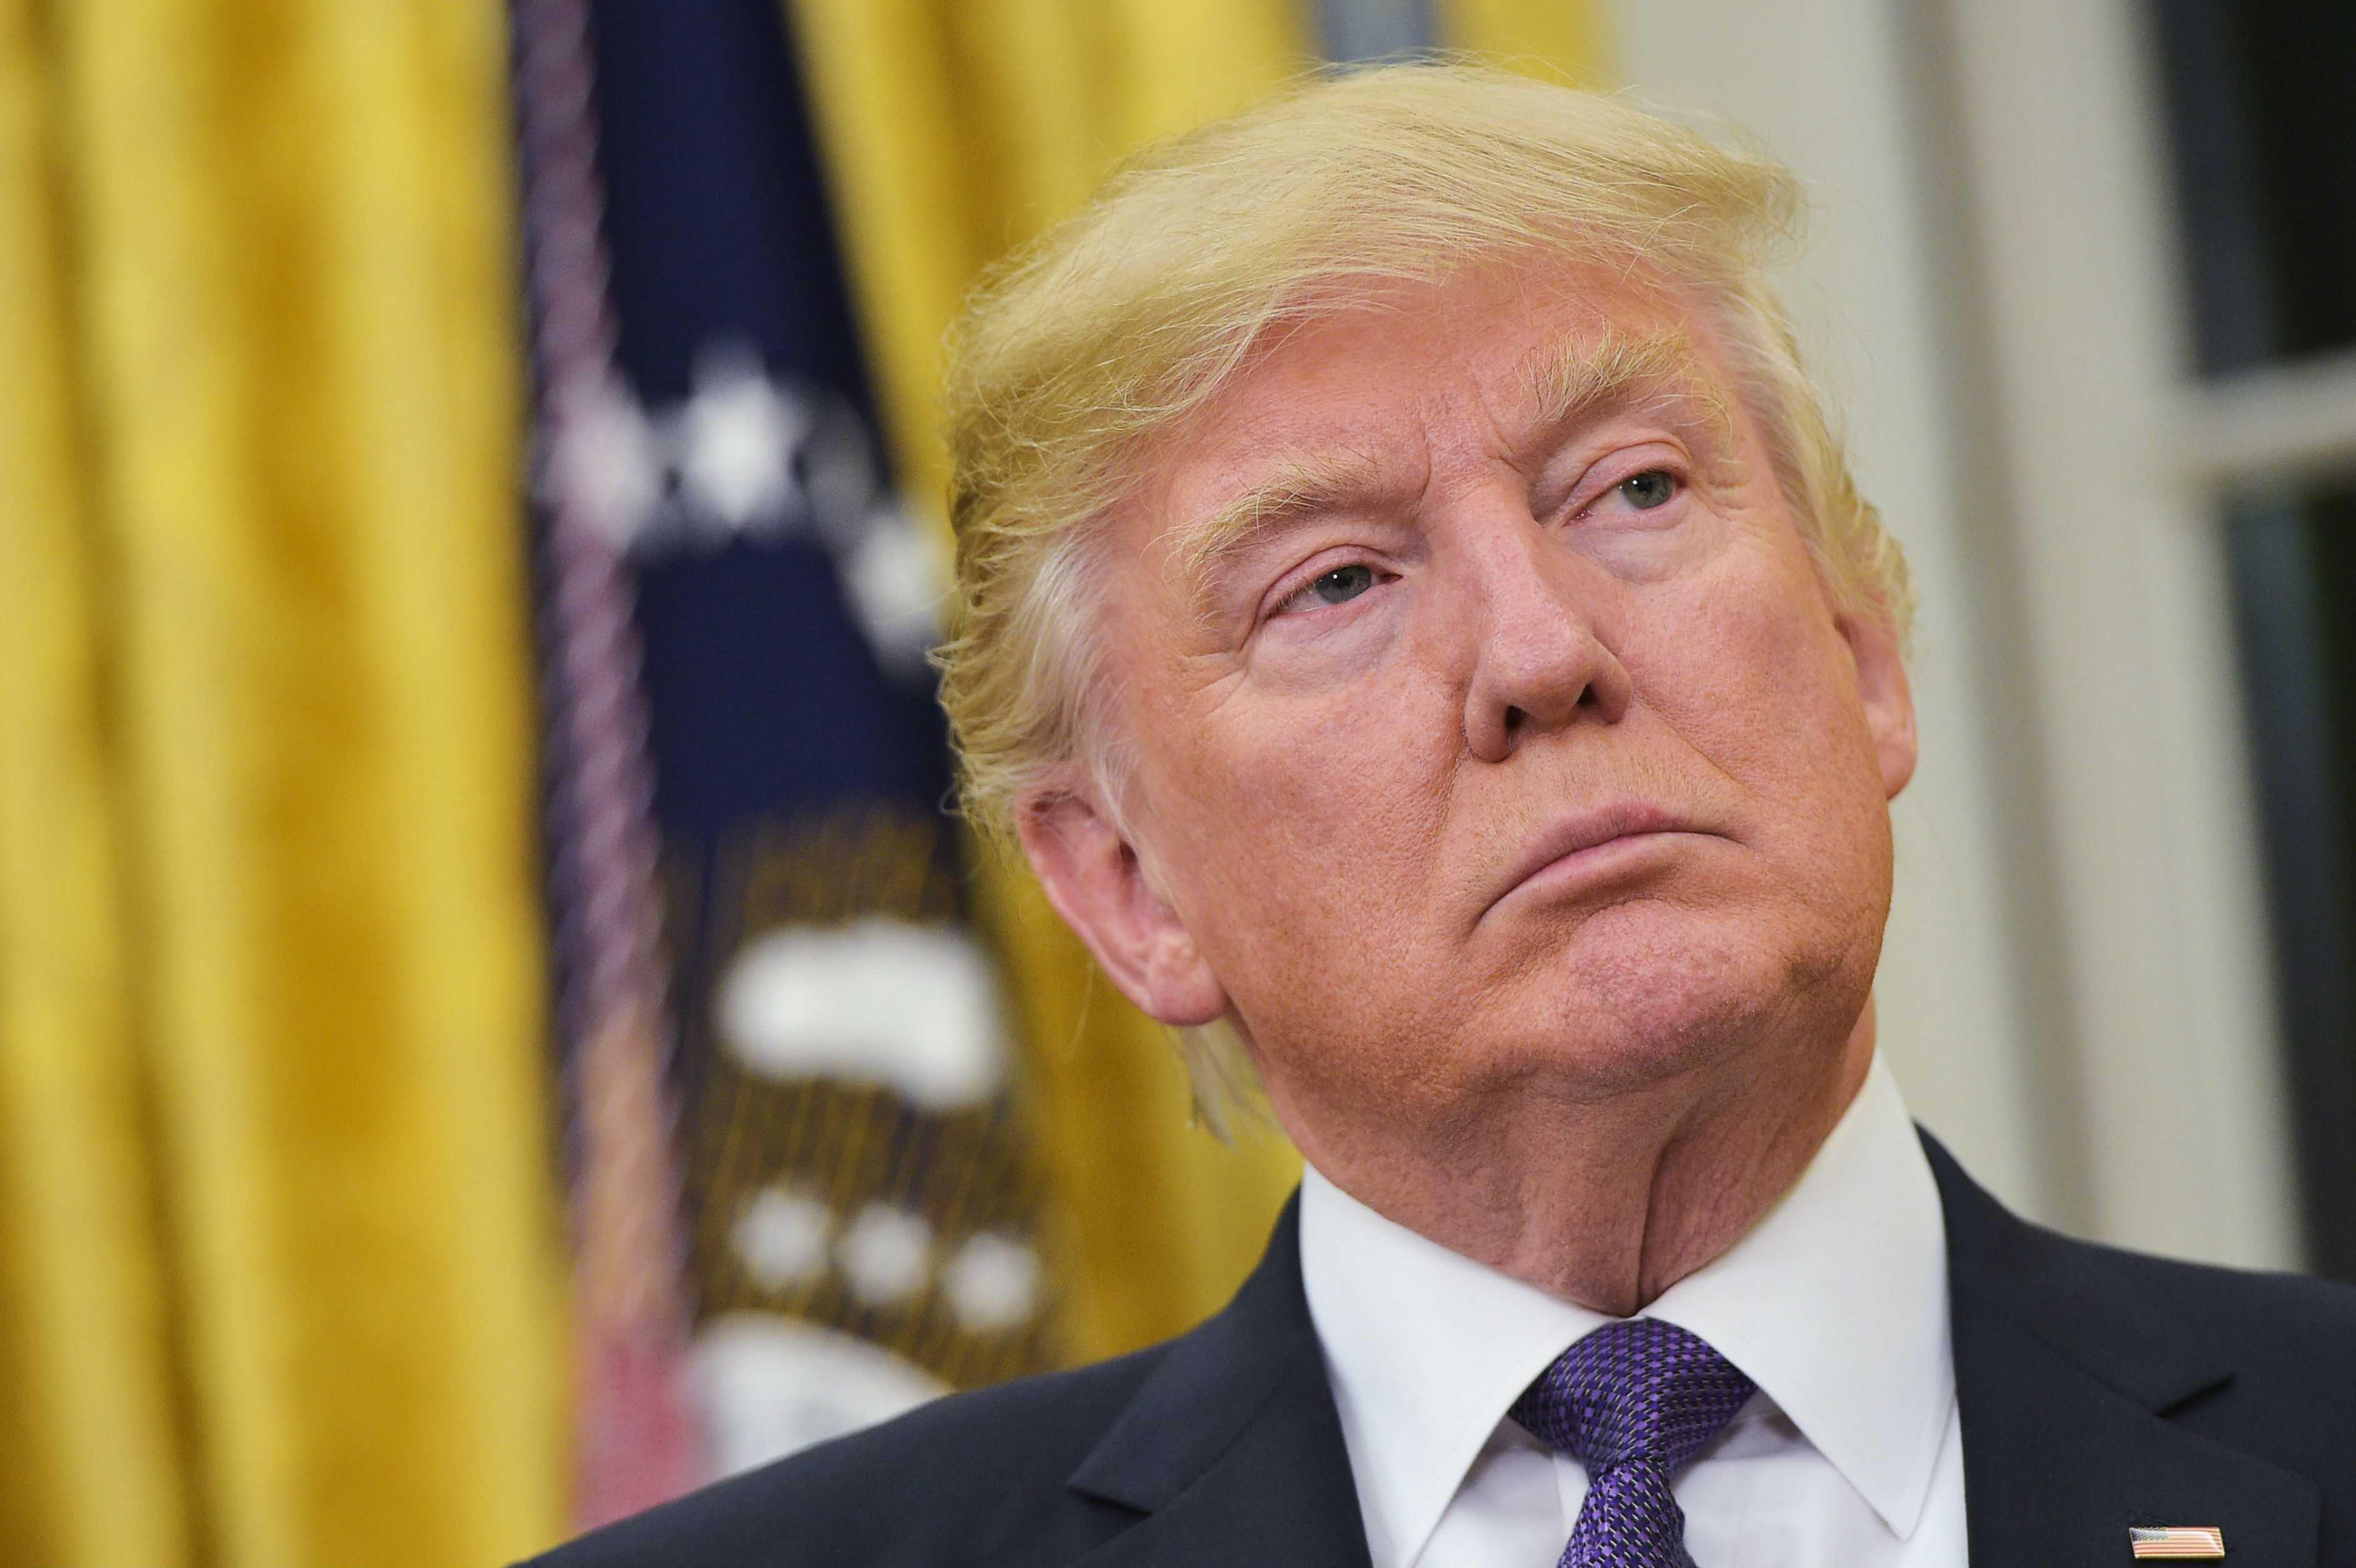 Trump niega ser racista, mientras EE.UU. celebra a Martin Luther King